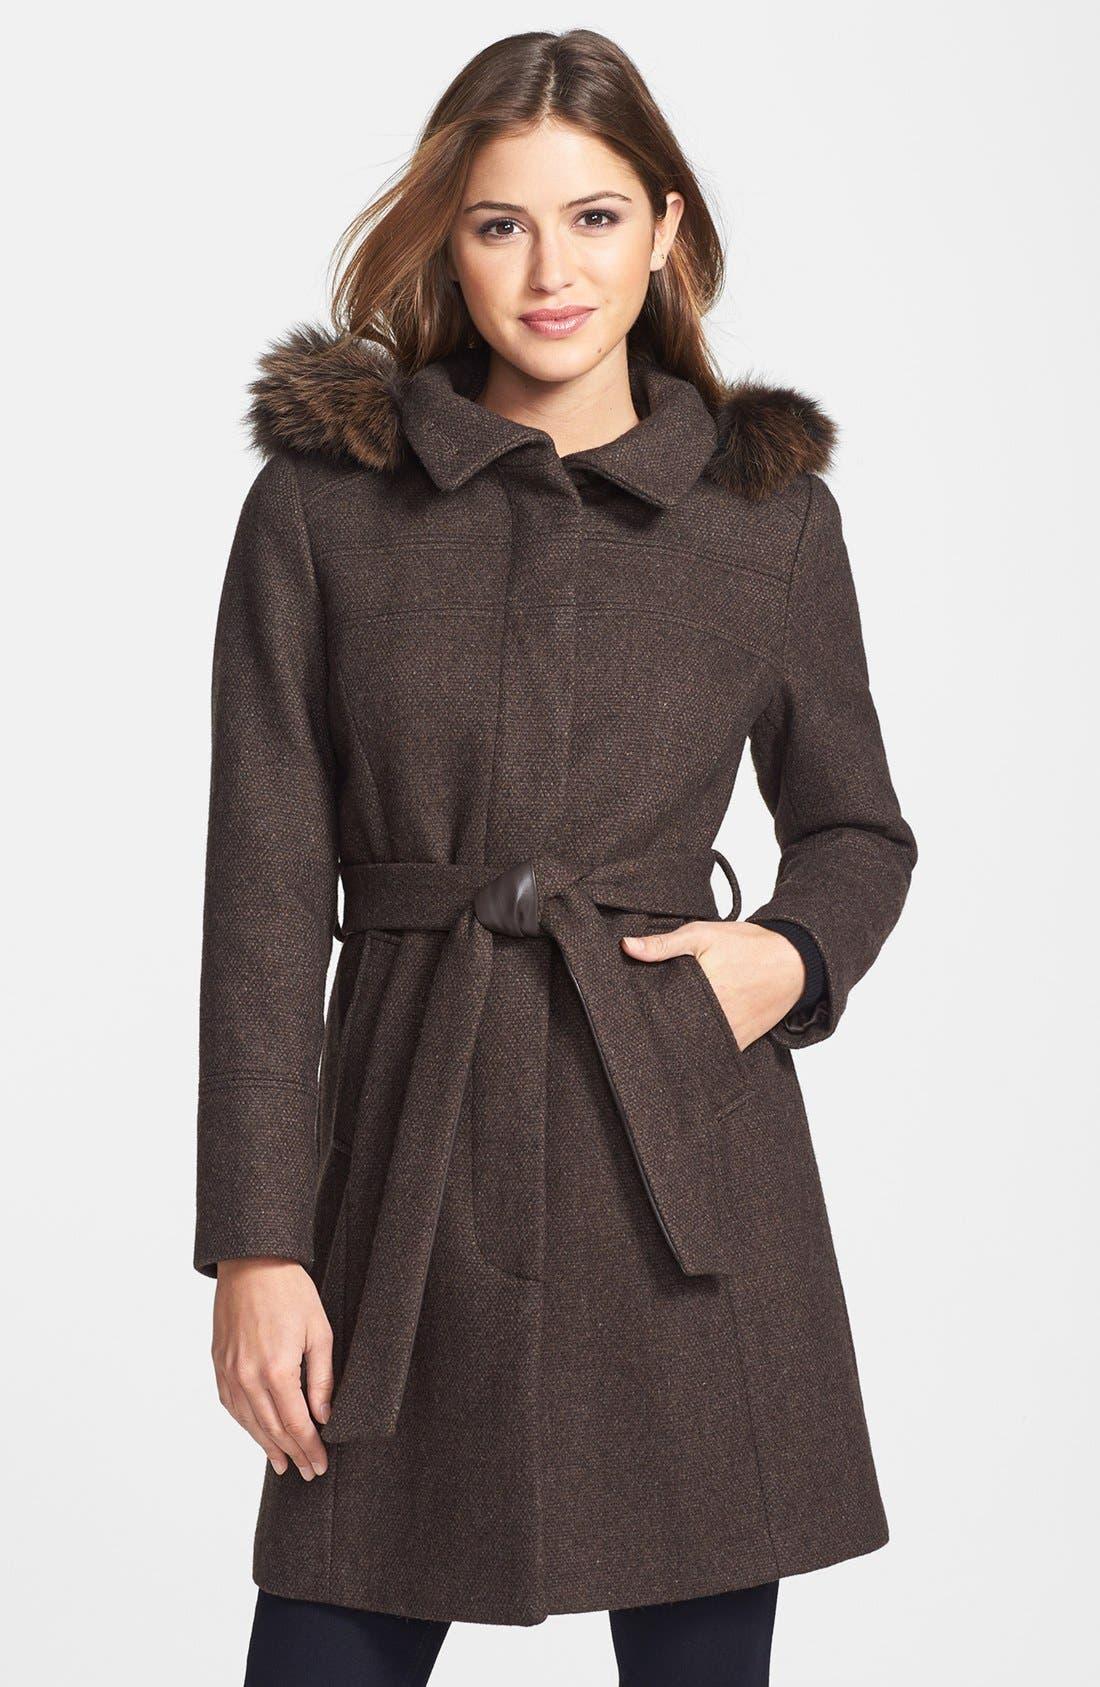 Main Image - Ellen Tracy Genuine Fox Fur Trim Hooded Coat (Petite) (Online Only)